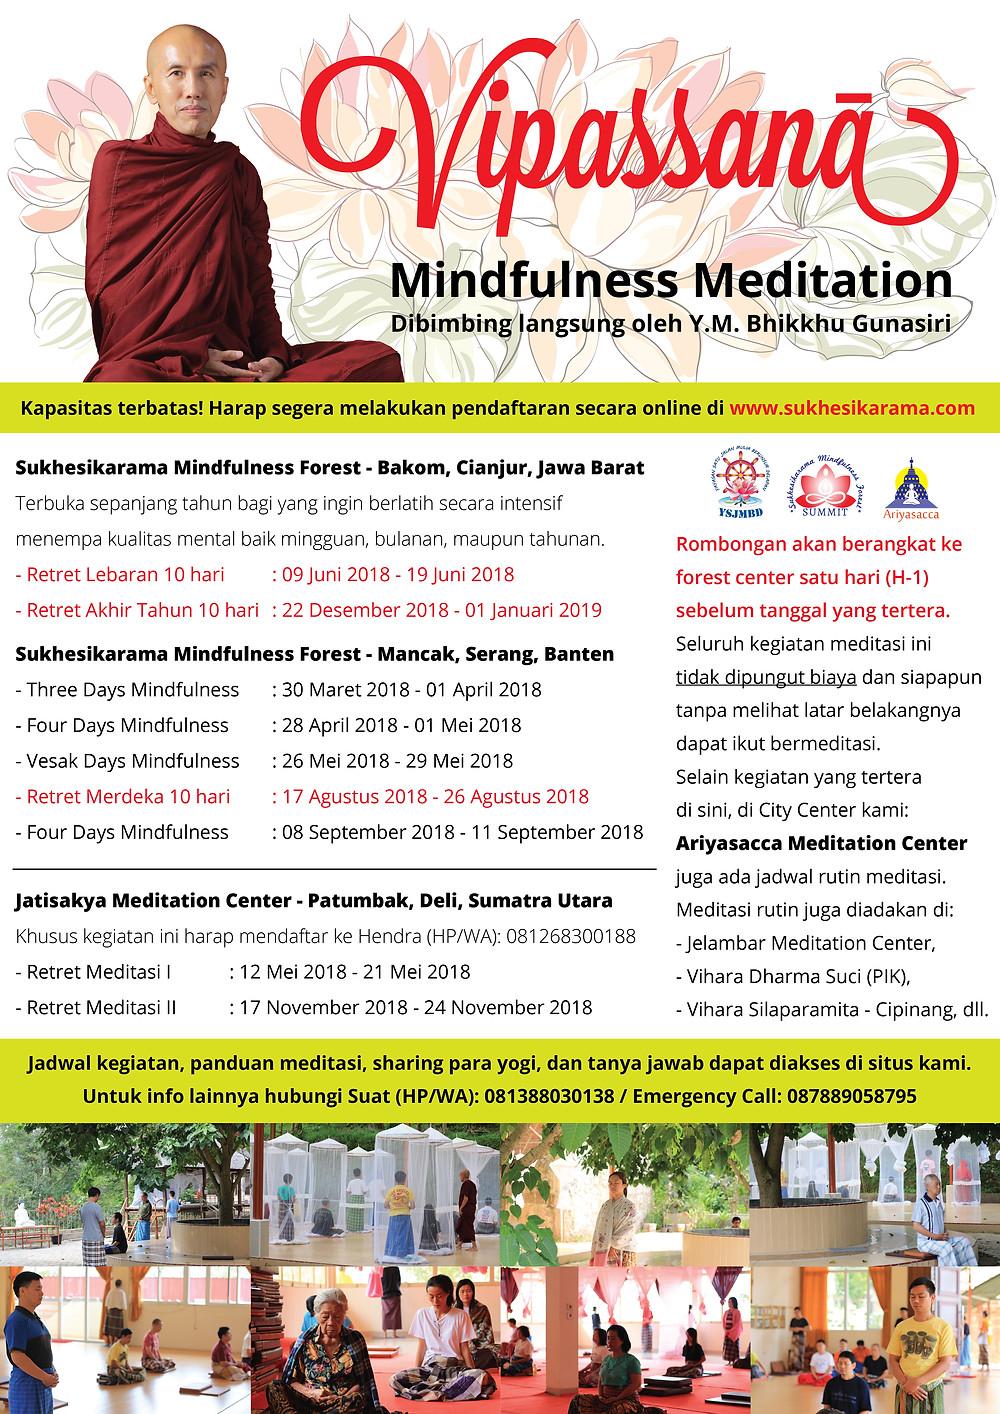 Jadwal Retret Meditasi 2018